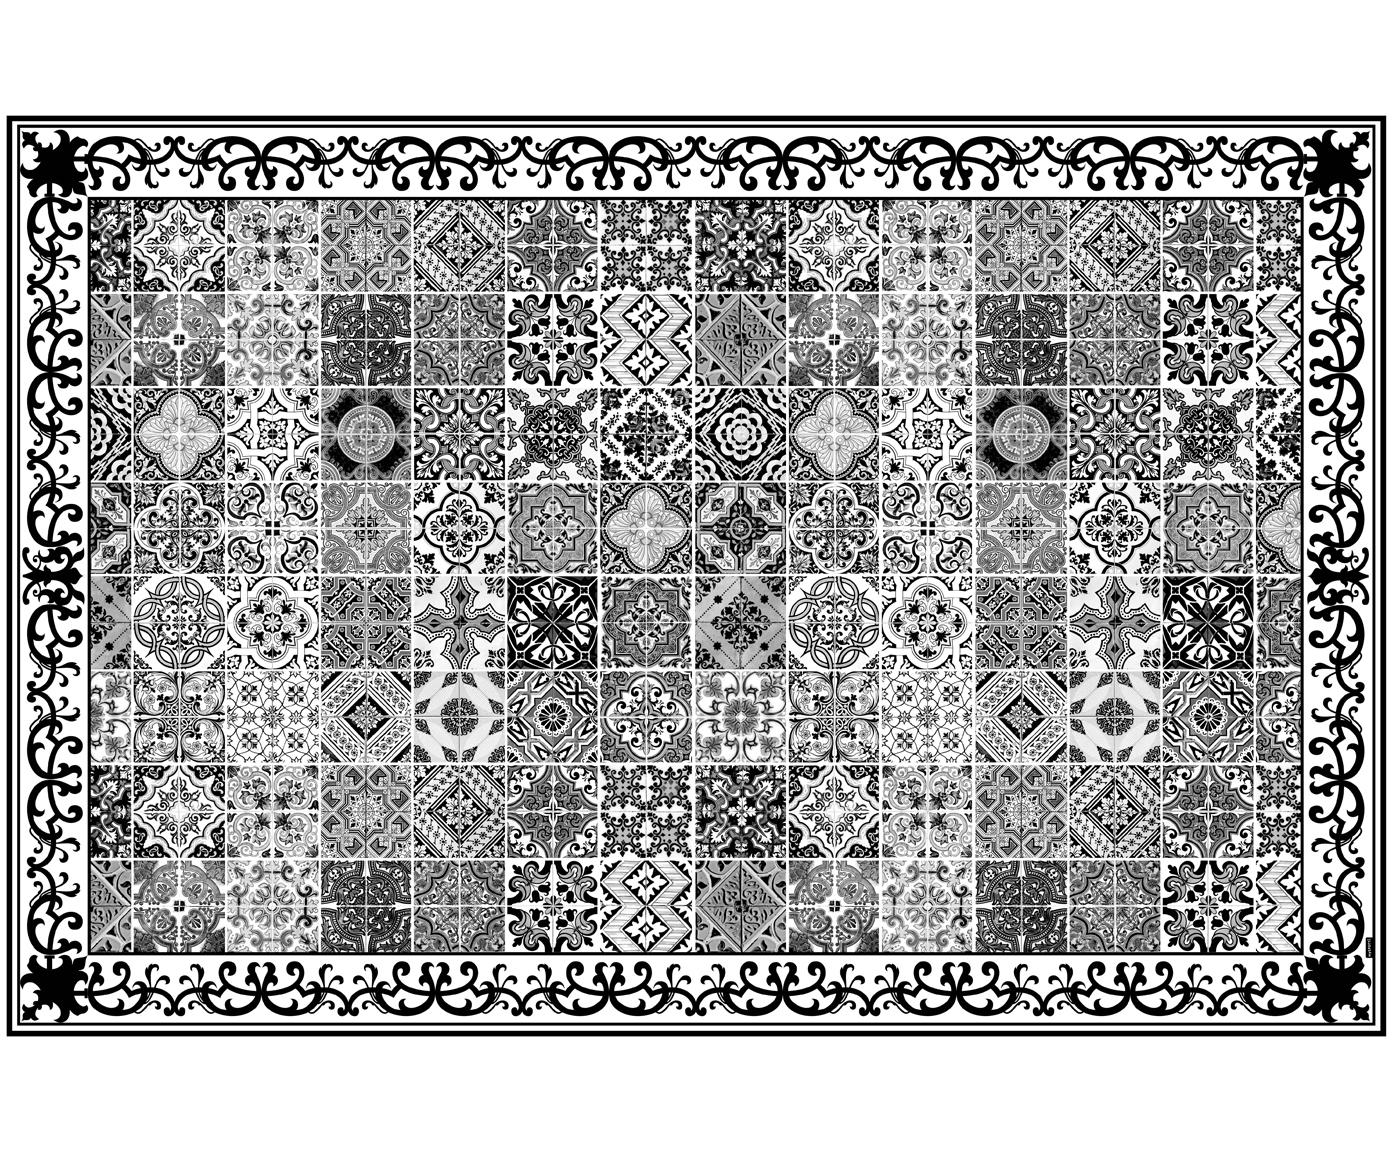 Vinyl-Bodenmatte Olè, Vinyl, recycelbar, Schwarz, Weiß, Grau, 135 x 200 cm